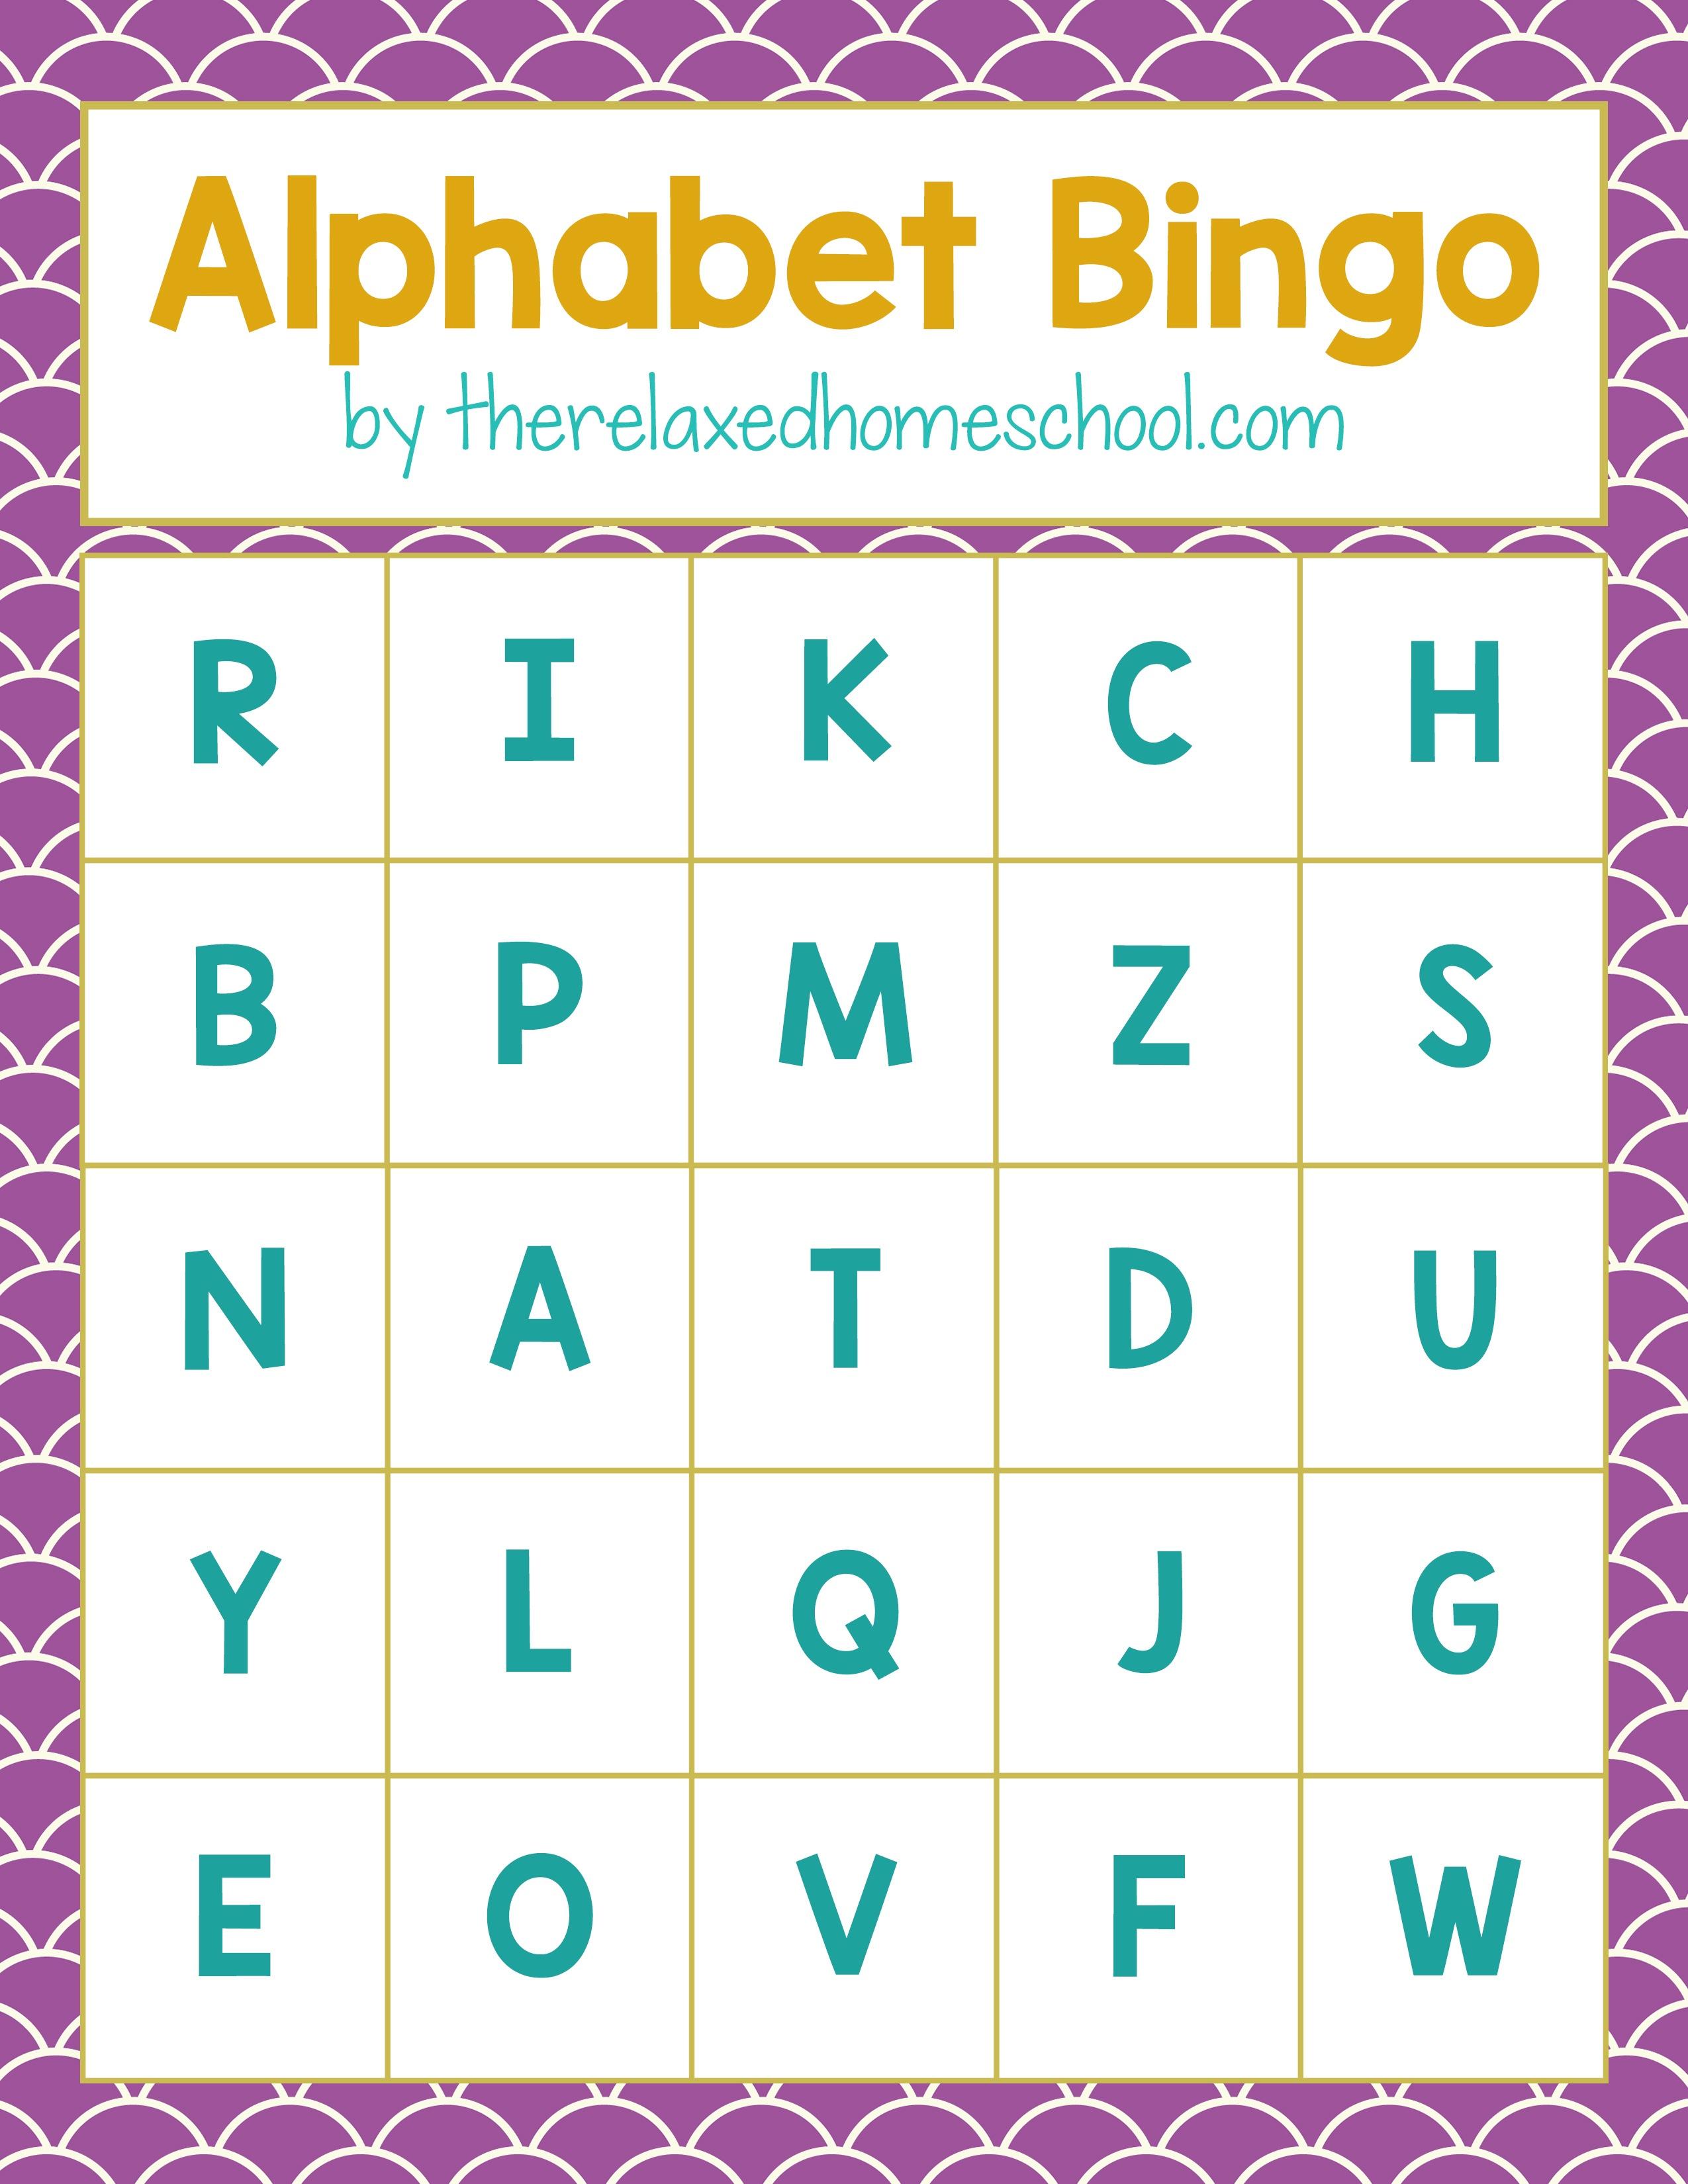 Free Printable! Alphabet Letters Bingo Game - Download Here! - Free Printable Bingo